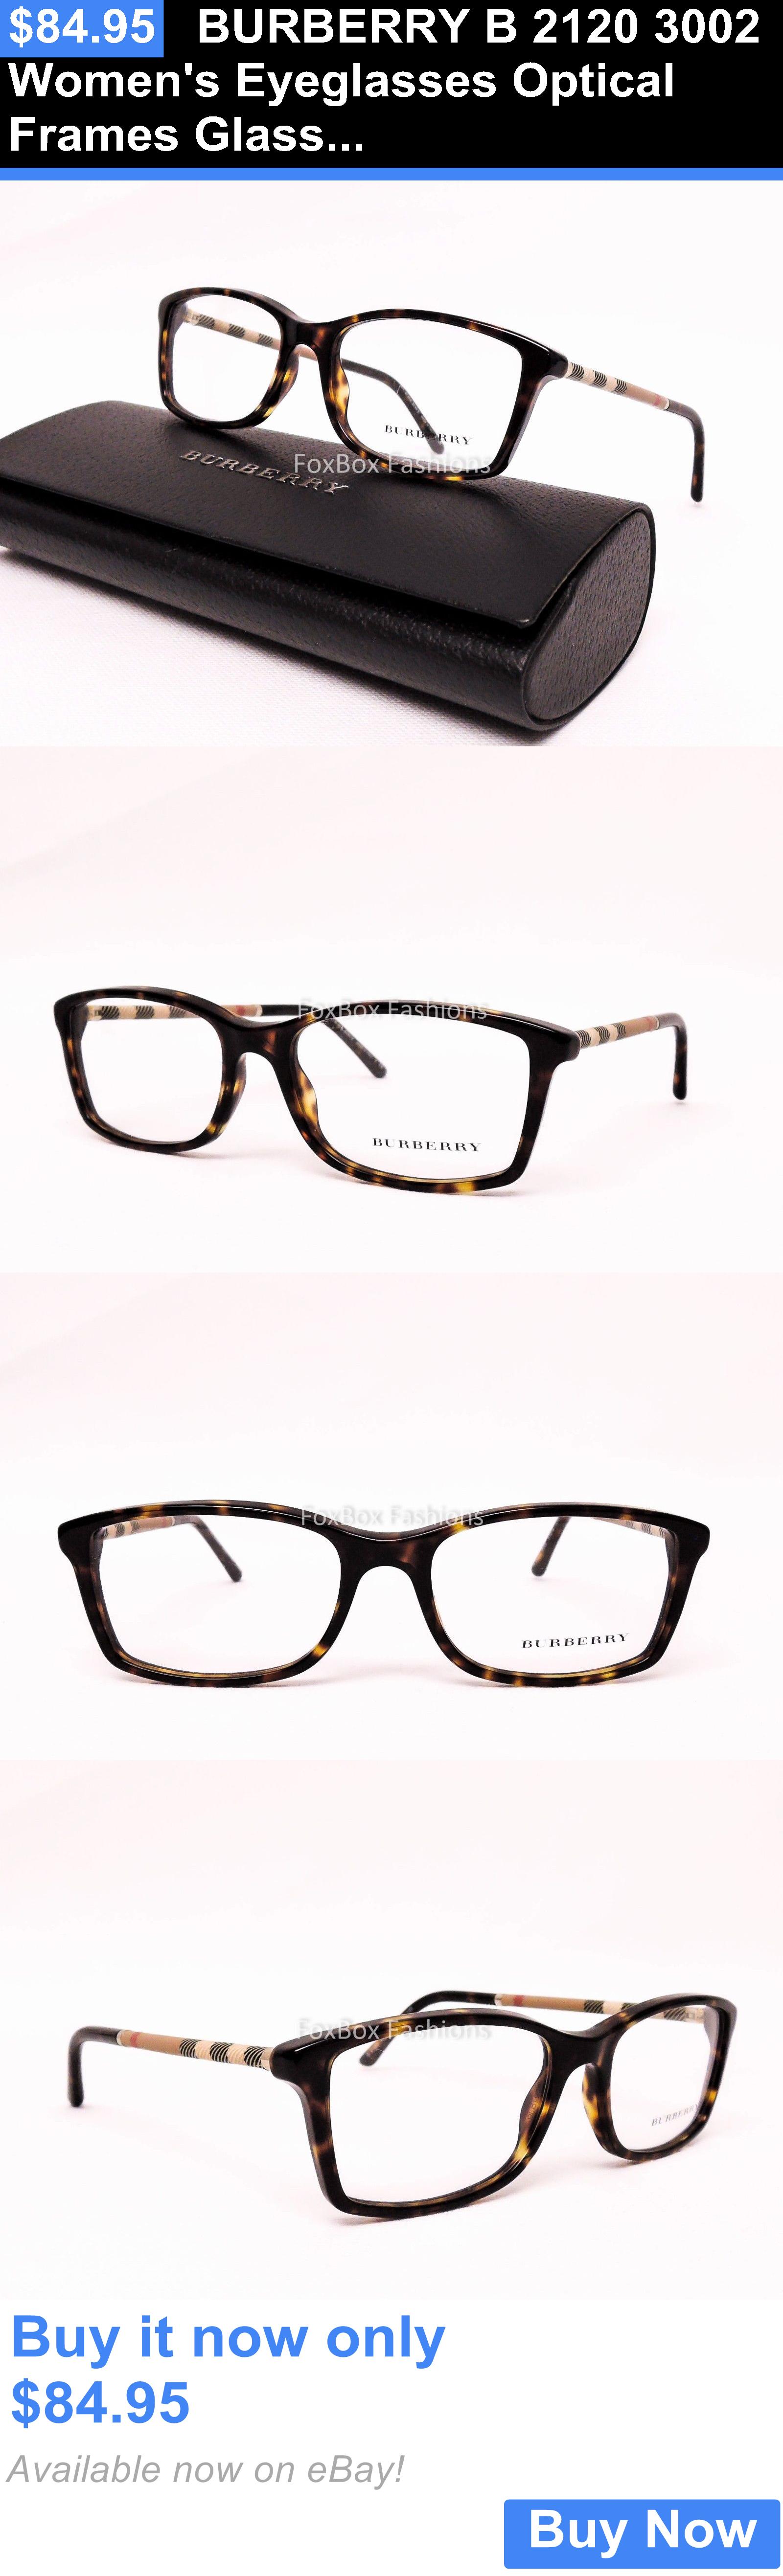 d75c1a4ed515 Eyeglass Frames  Burberry B 2120 3002 Womens Eyeglasses Optical Frames  Glasses Havana Plaid 51Mm BUY IT NOW ONLY   84.95